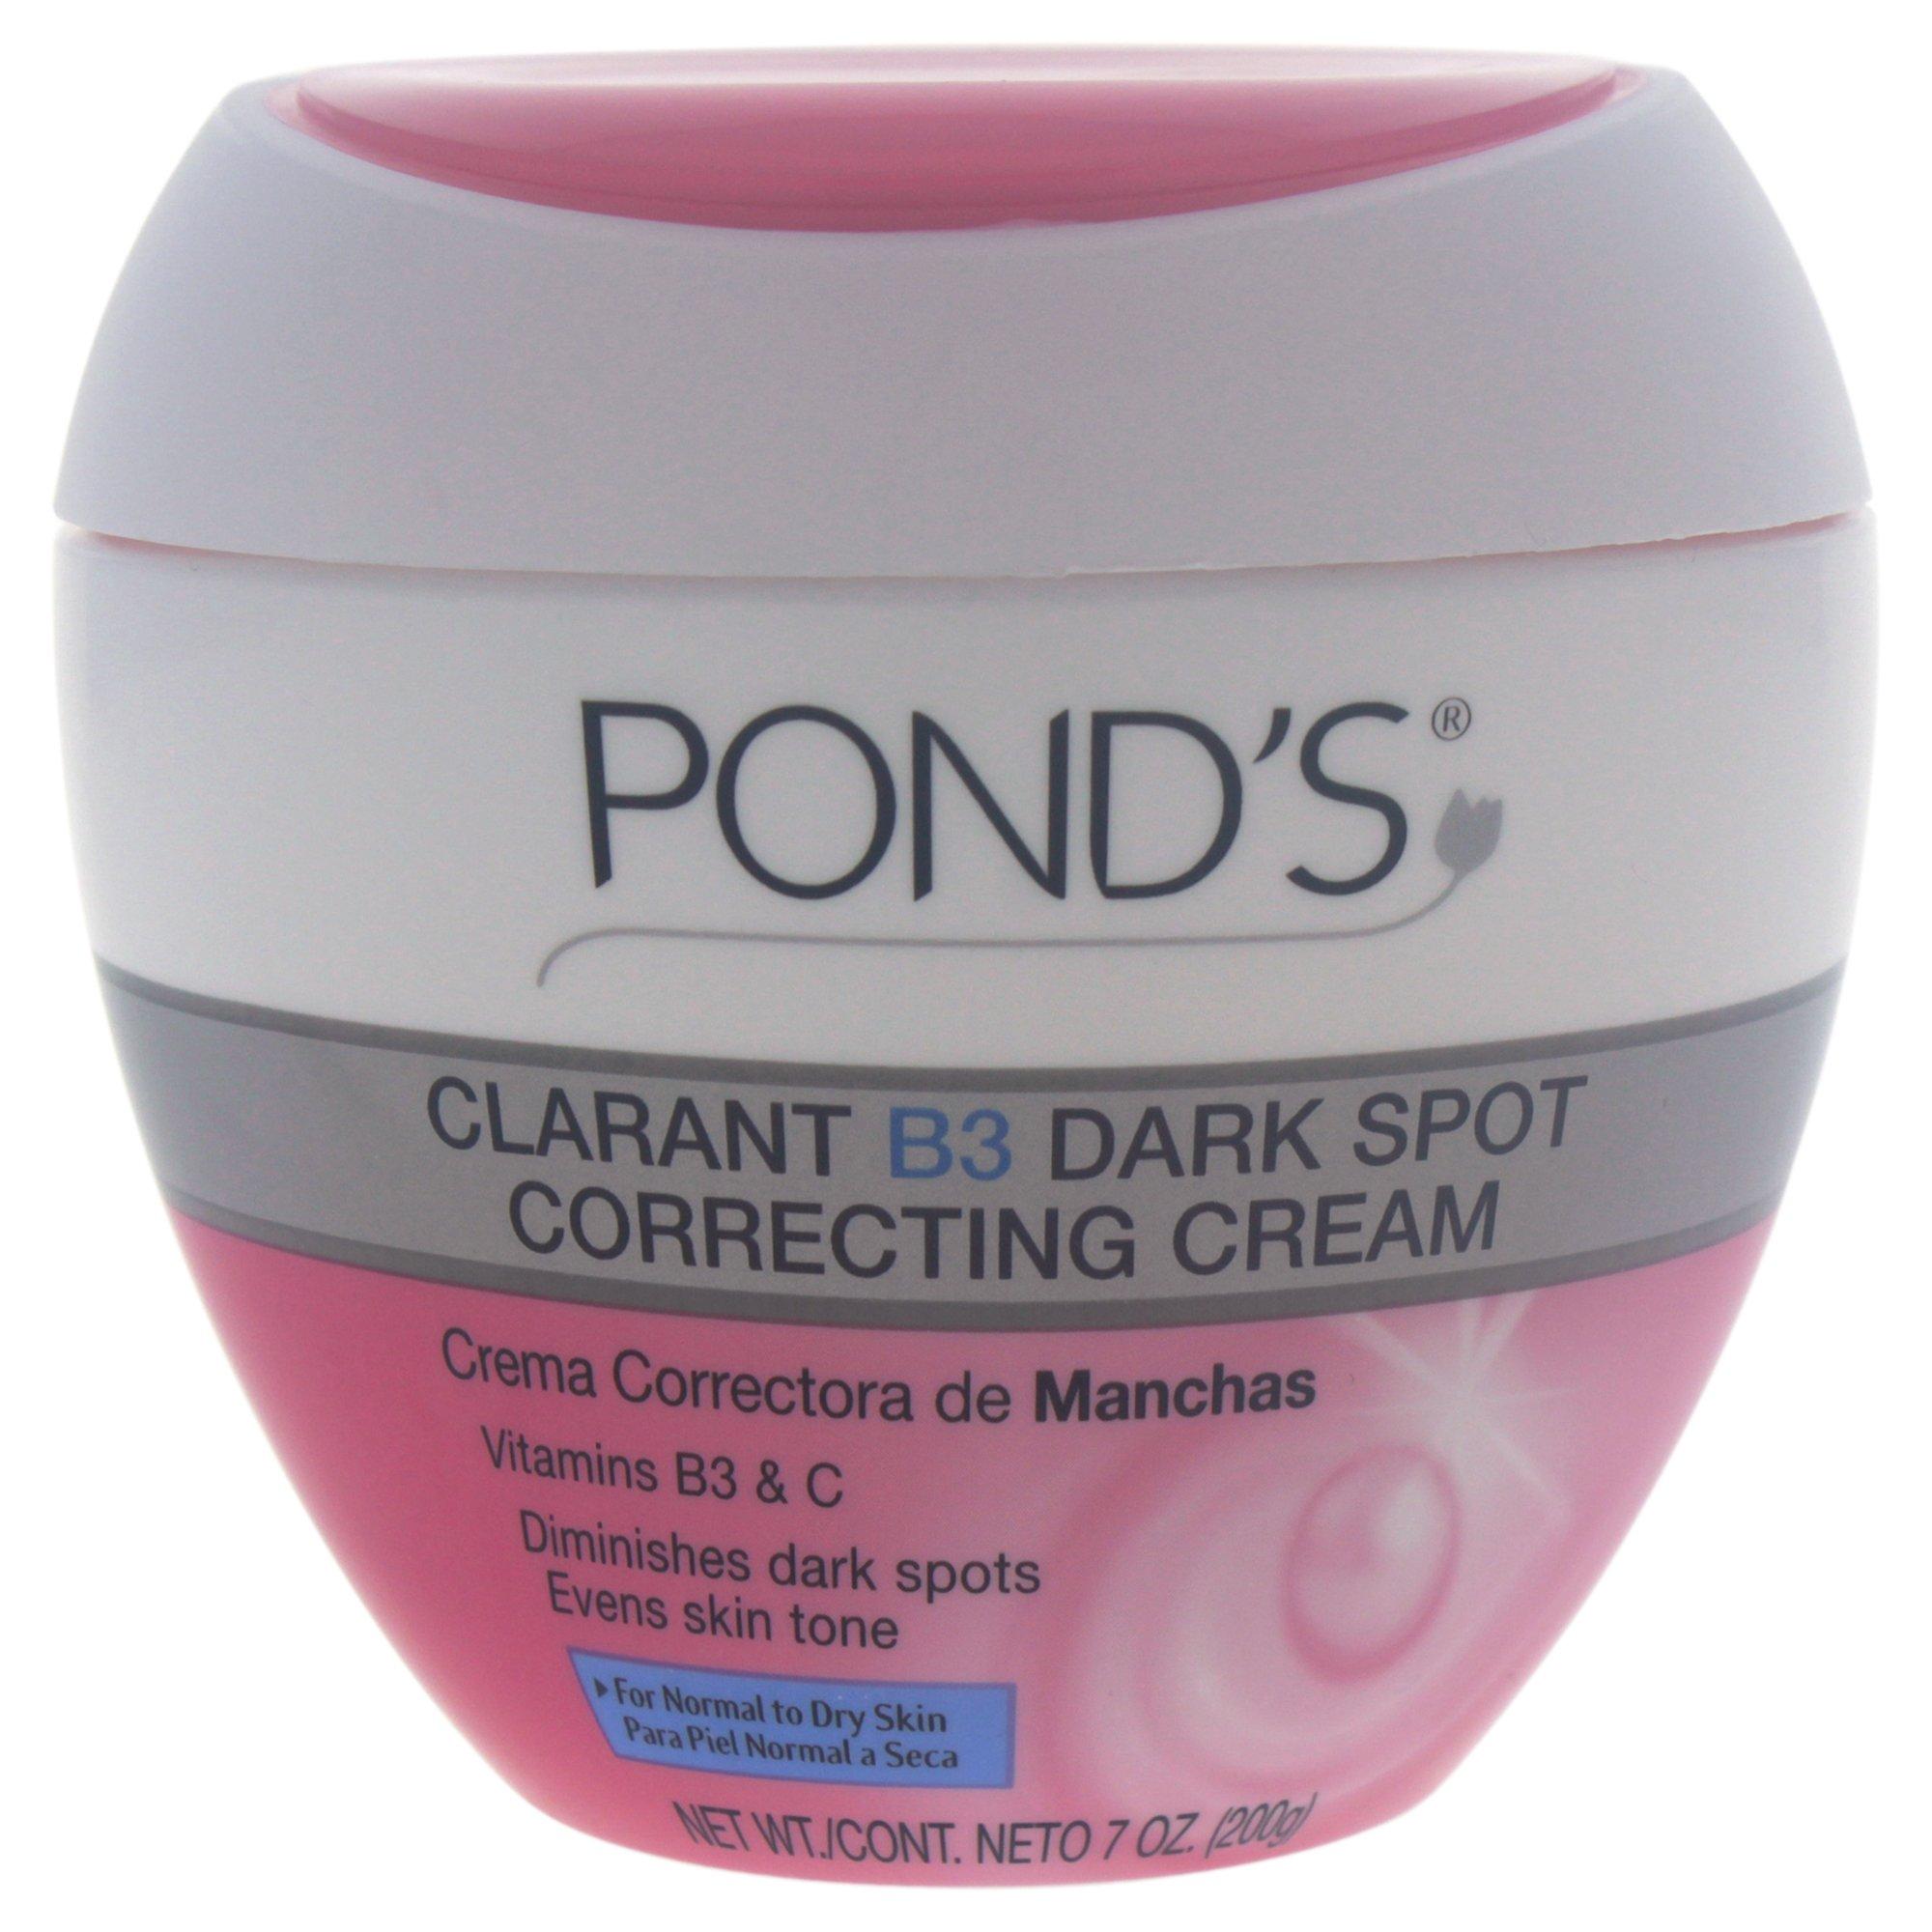 Pond's Correcting Cream, Clarant B3 Dark Spot Normal to Dry Skin 7 oz, Pack of 2